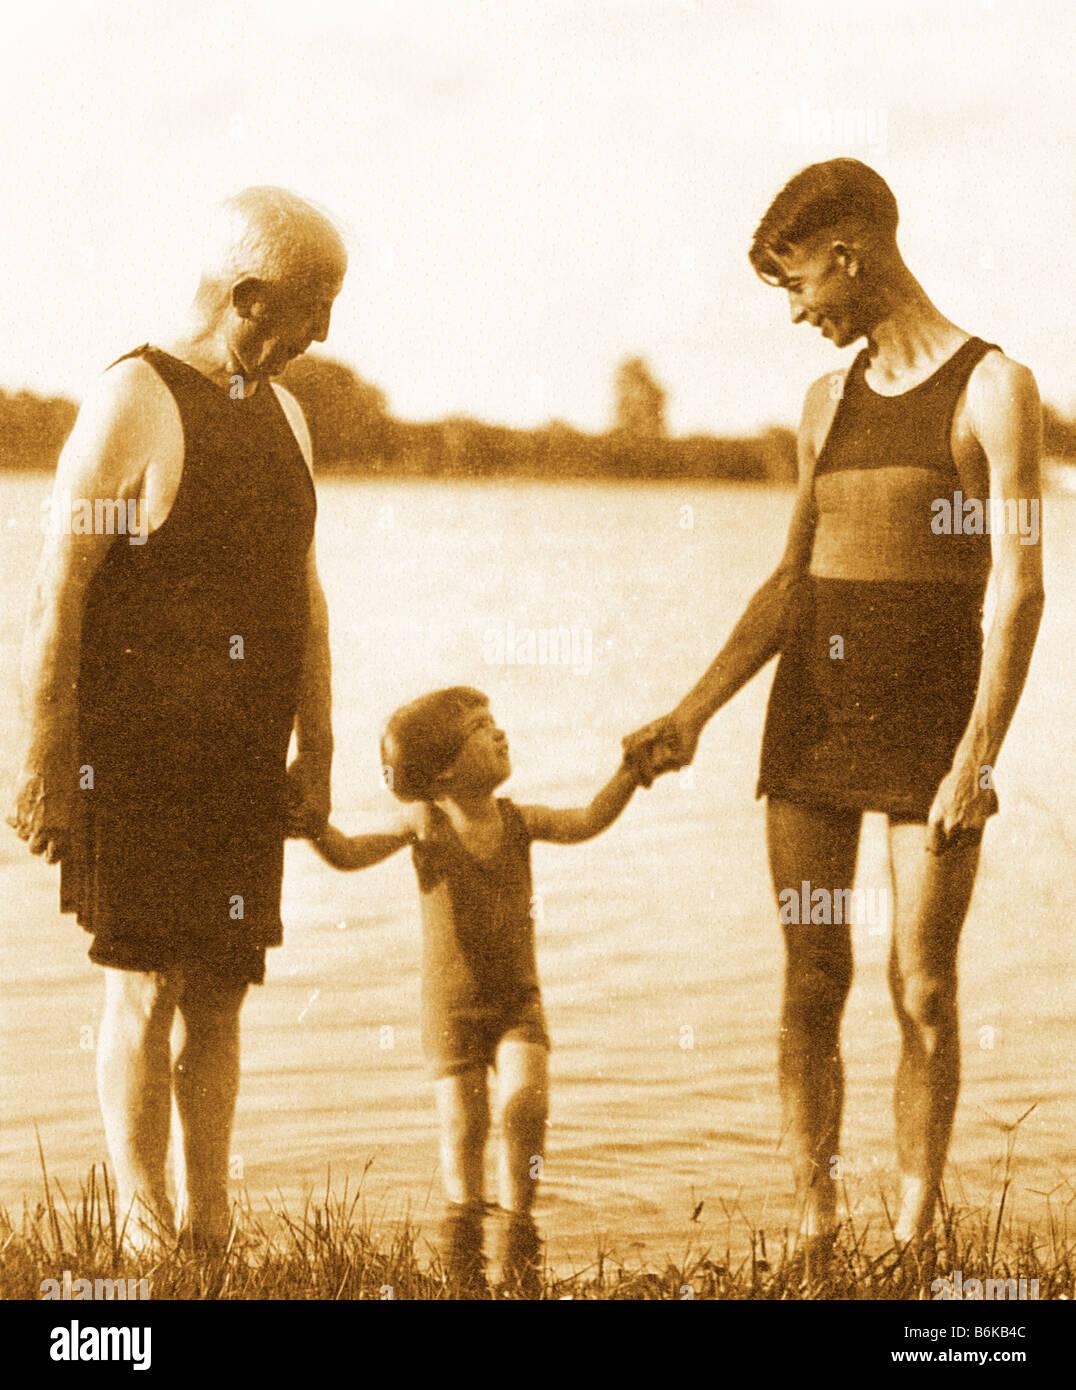 retro photo of three generations made circa 1920 by lake - Stock Image